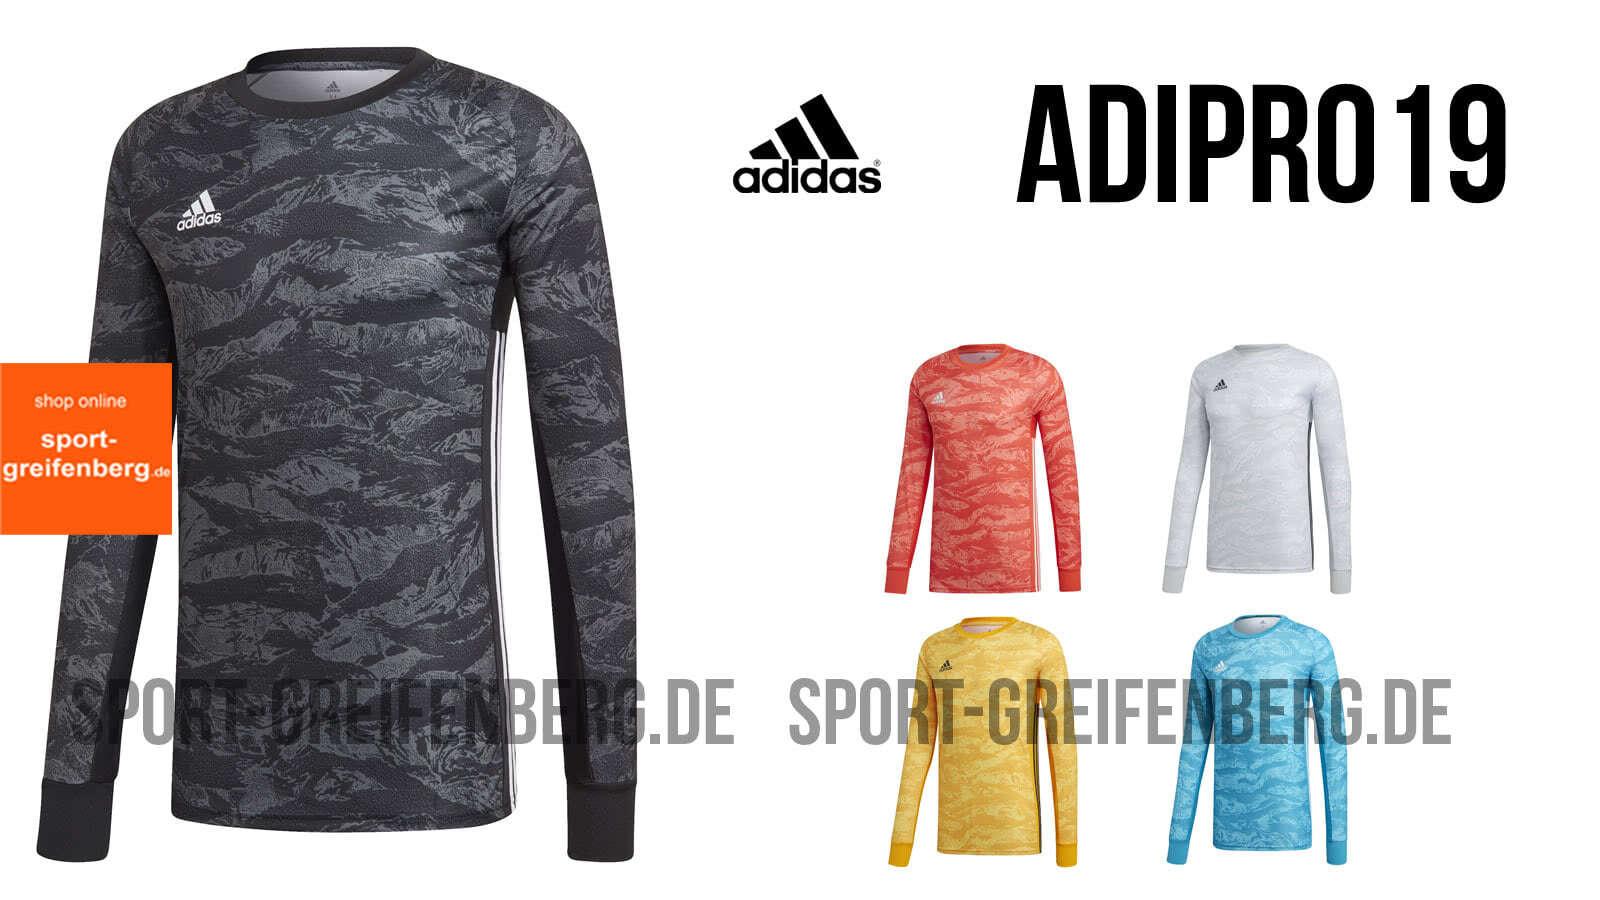 472c98110cf adidas adipro 19 GK ✓ Torwart Trikot für 2019 2020 (Goalkeeper Jersey)